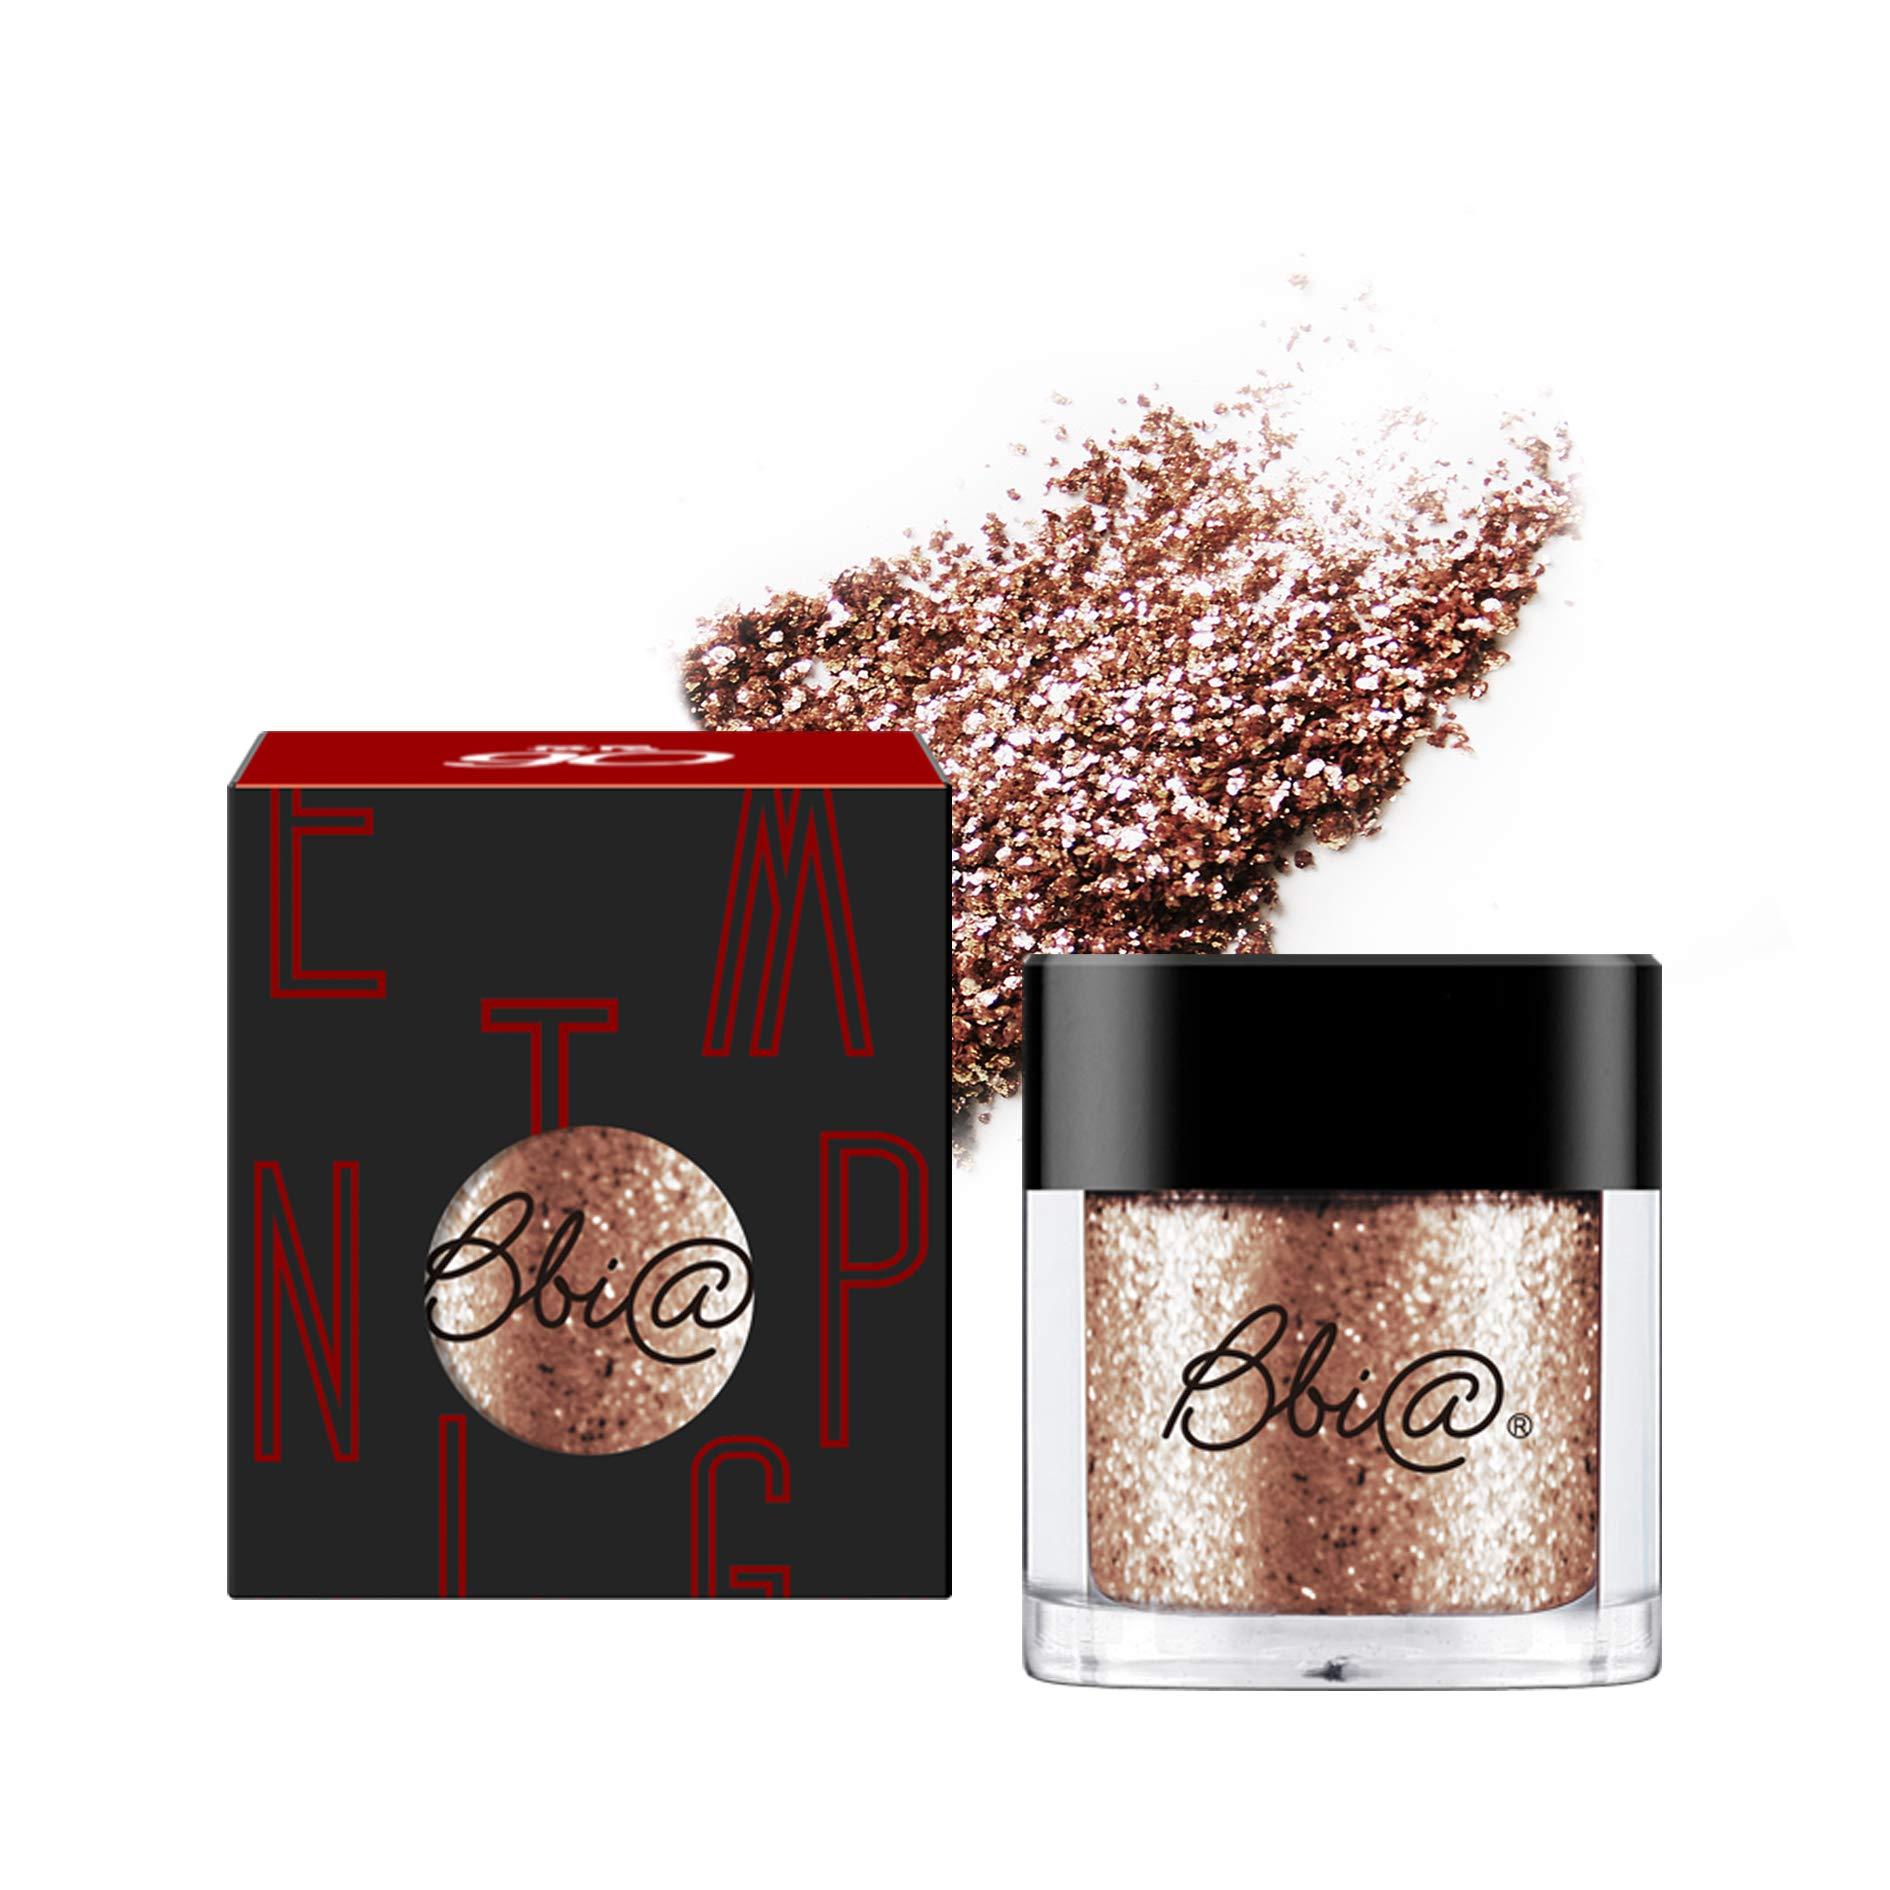 BBIA Pigments Glitter Eyeshadow, 5Light Series (08 Perfect Diamond Bronze) 0.06oz